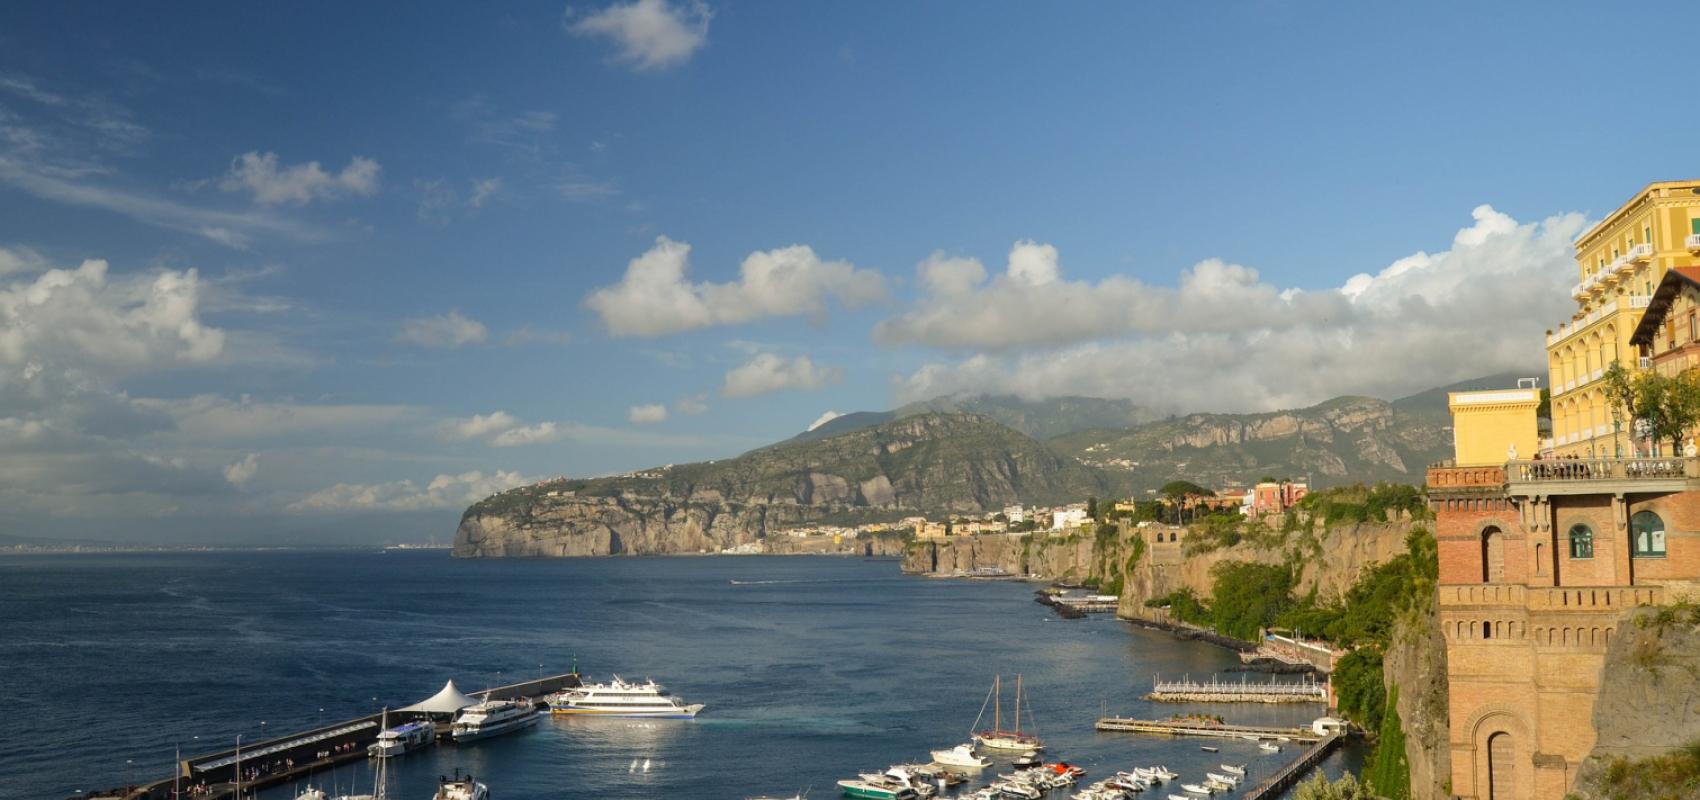 Sorrento coastline